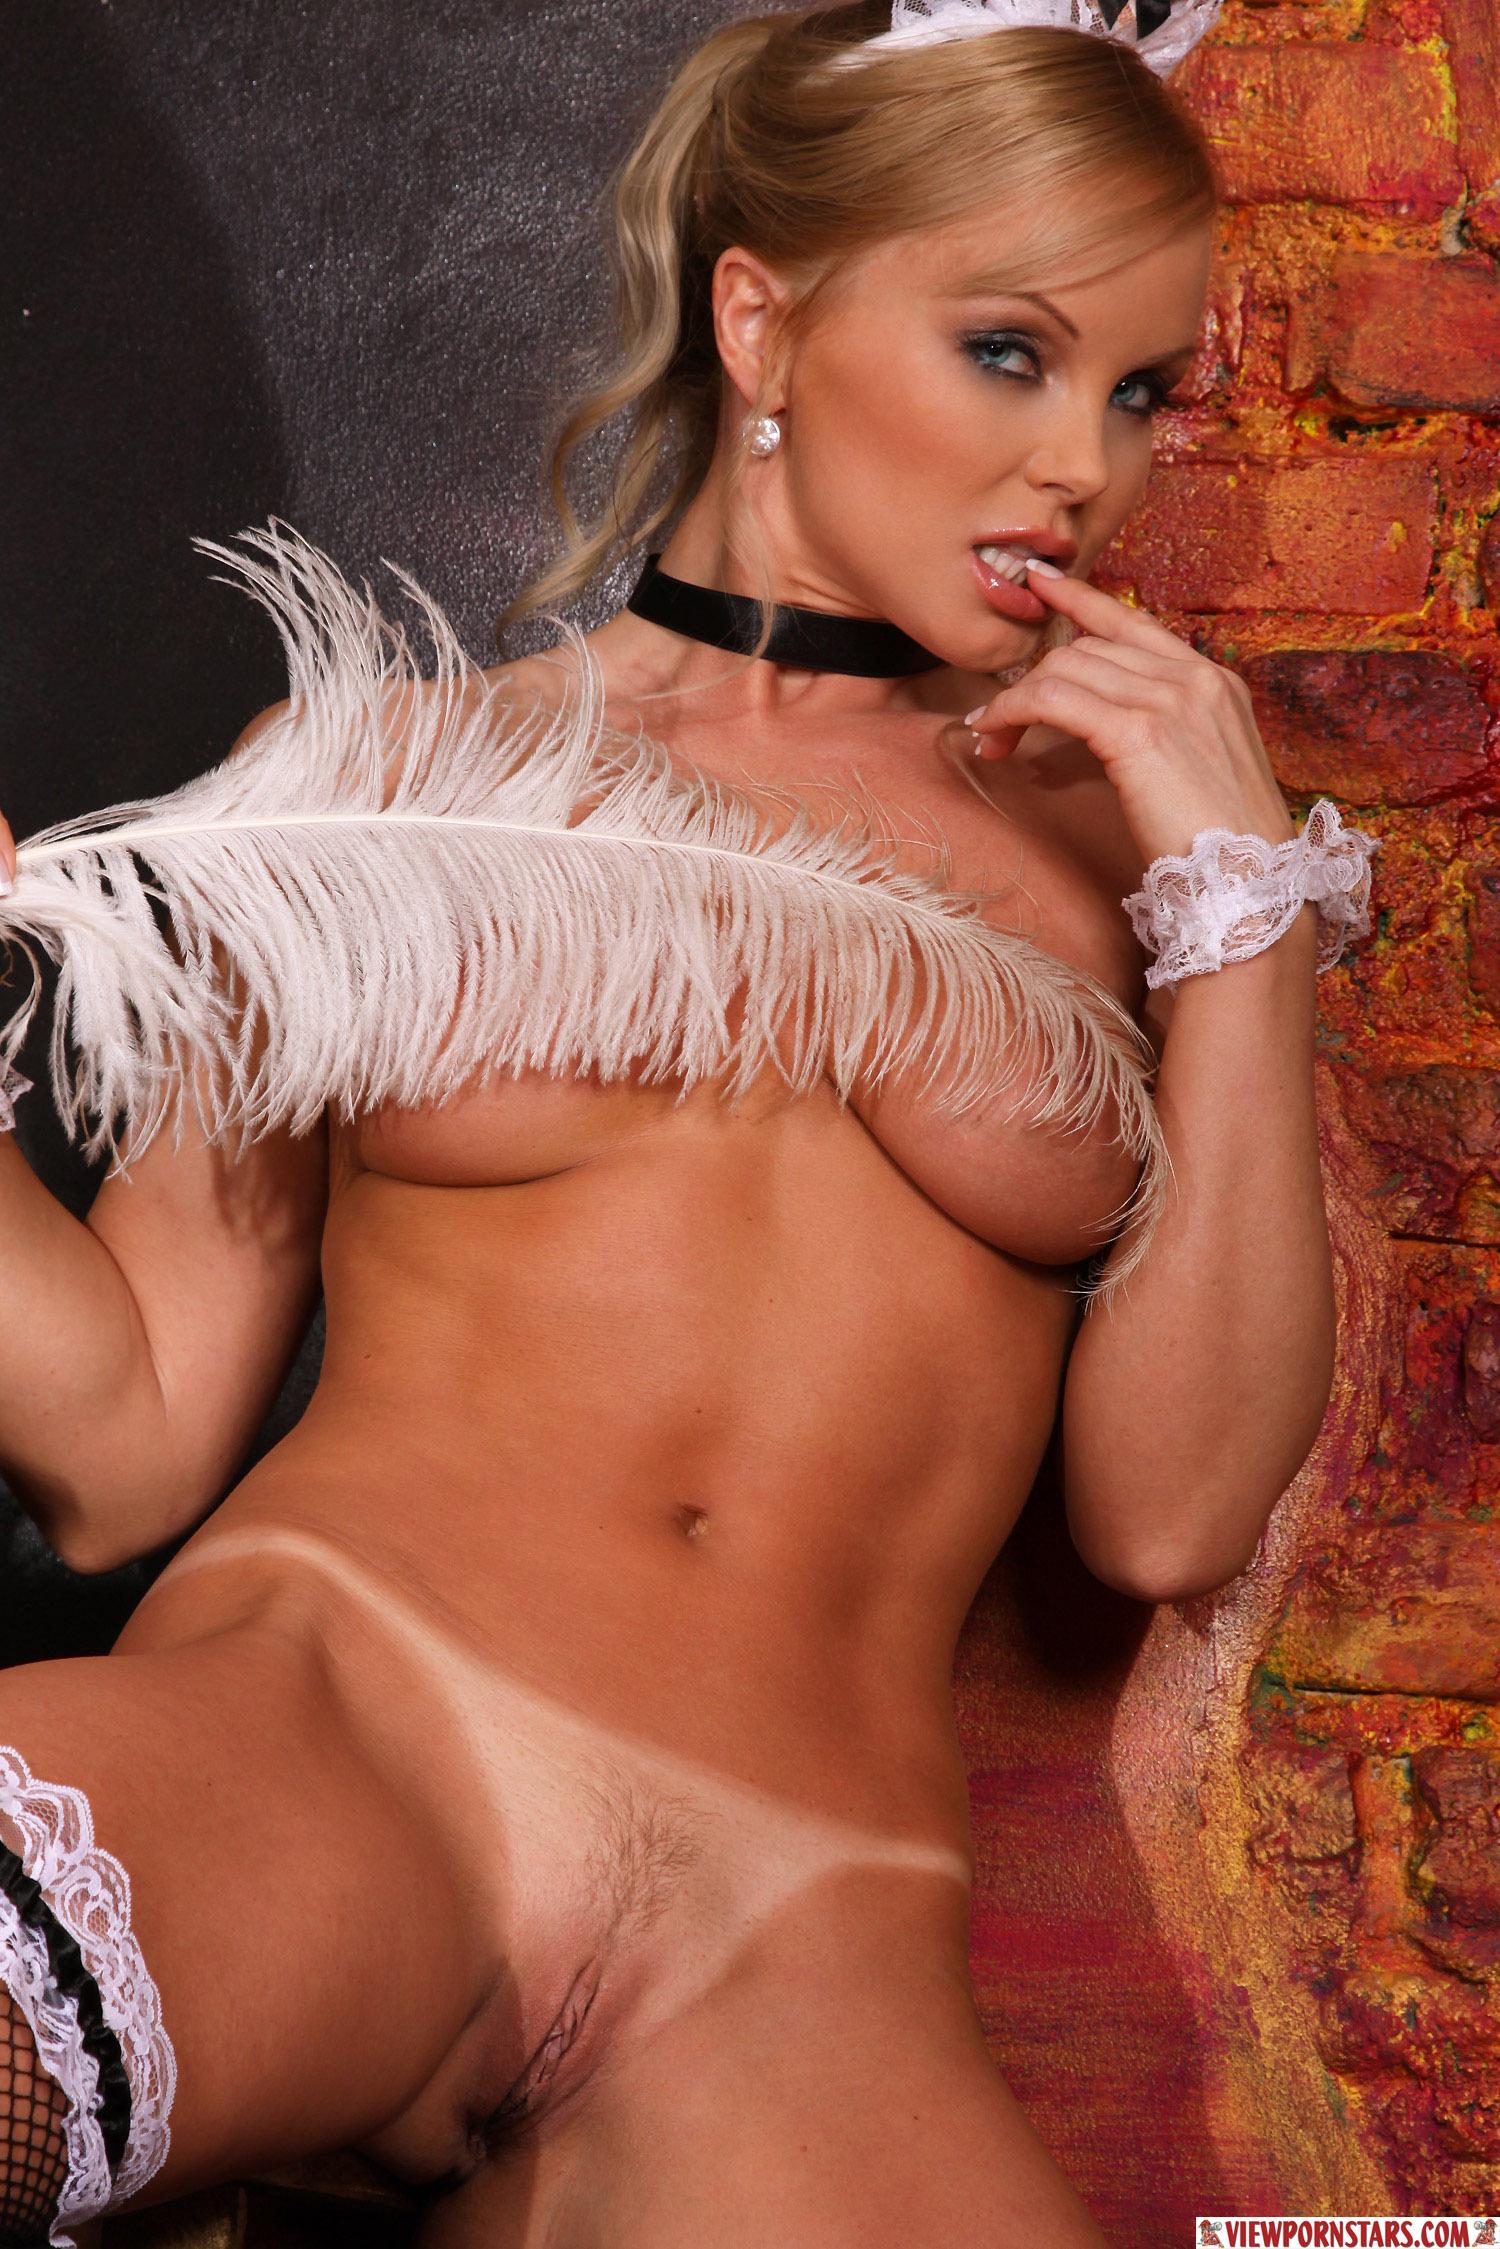 Сильвия саинт порно фото 10 фотография